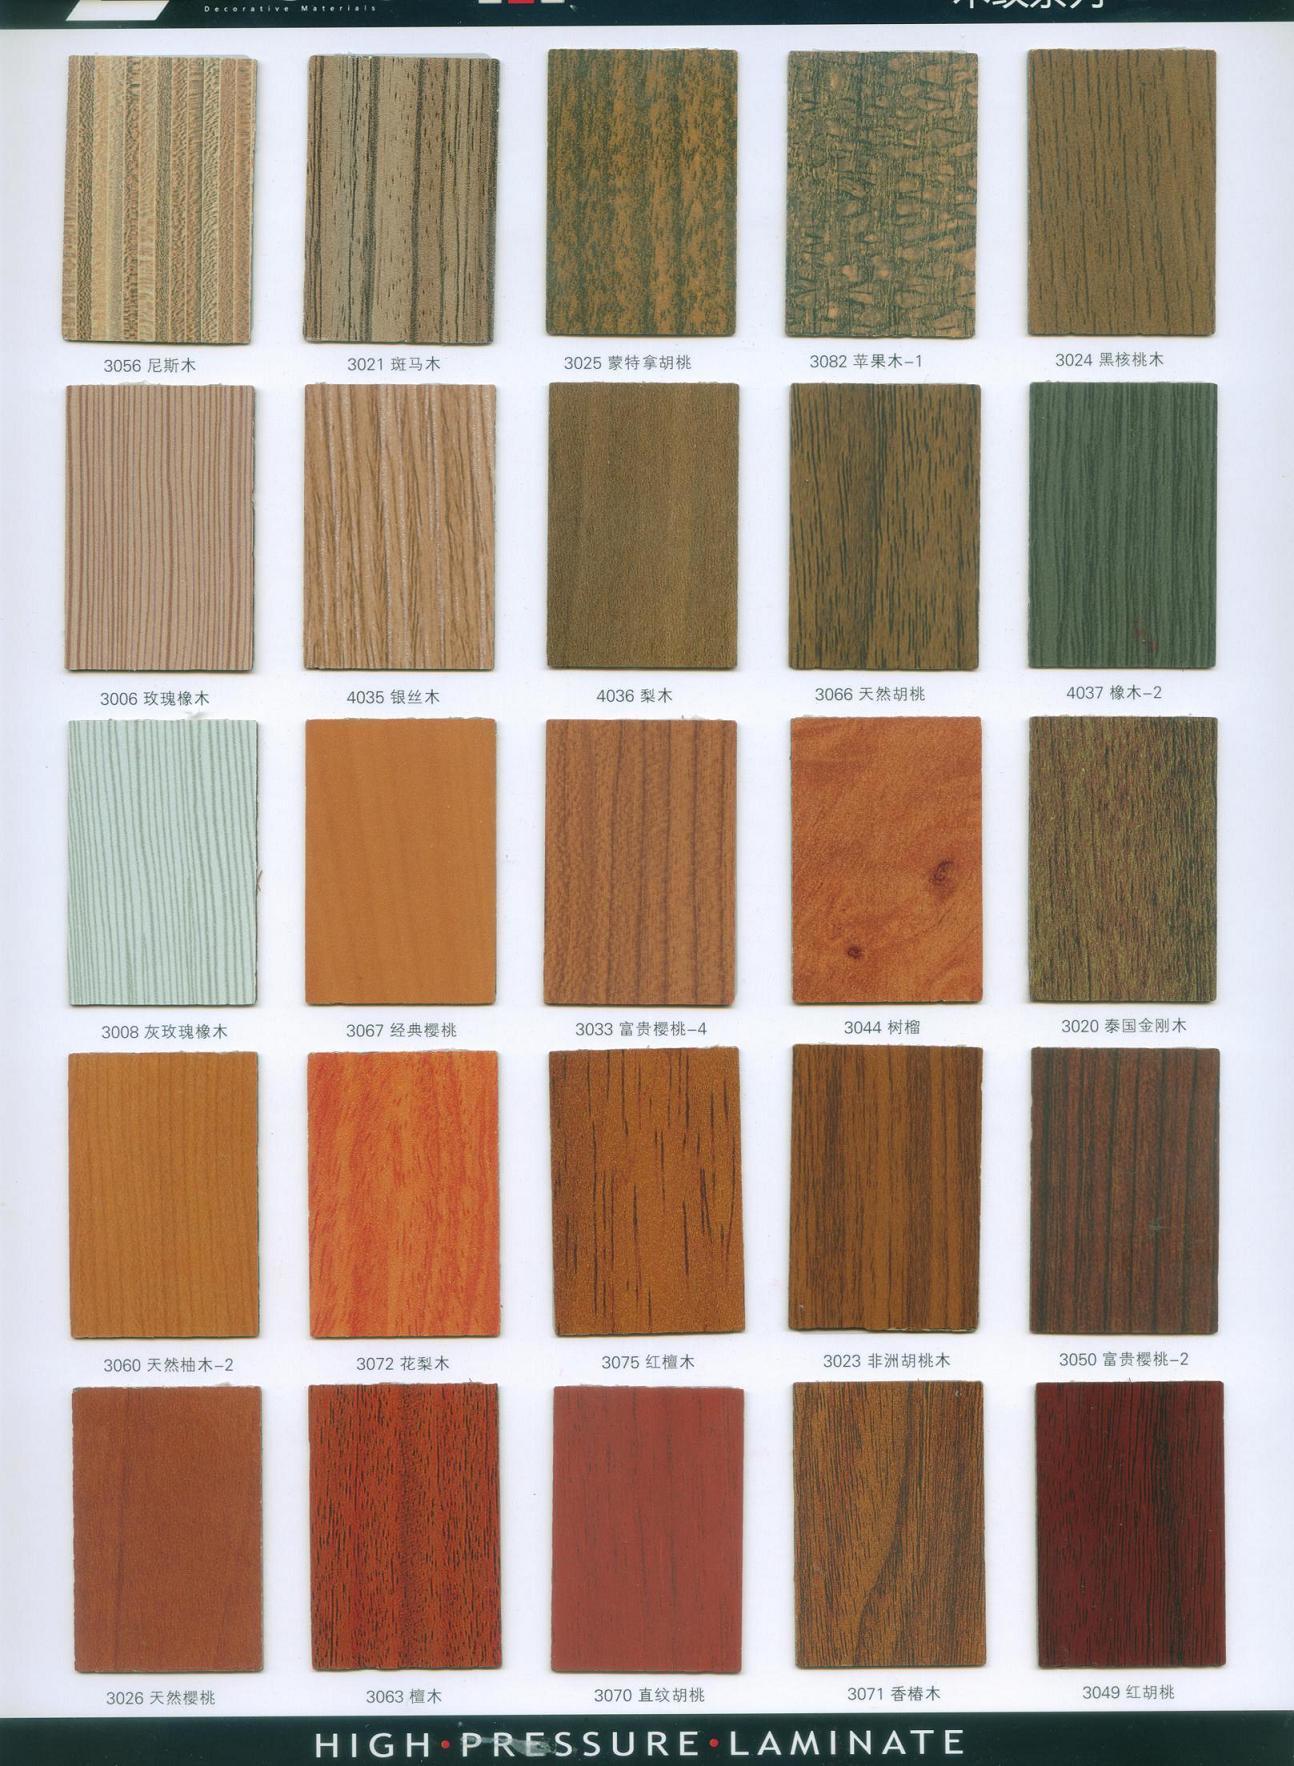 Wood Grain Color Formica Sheet Slaes